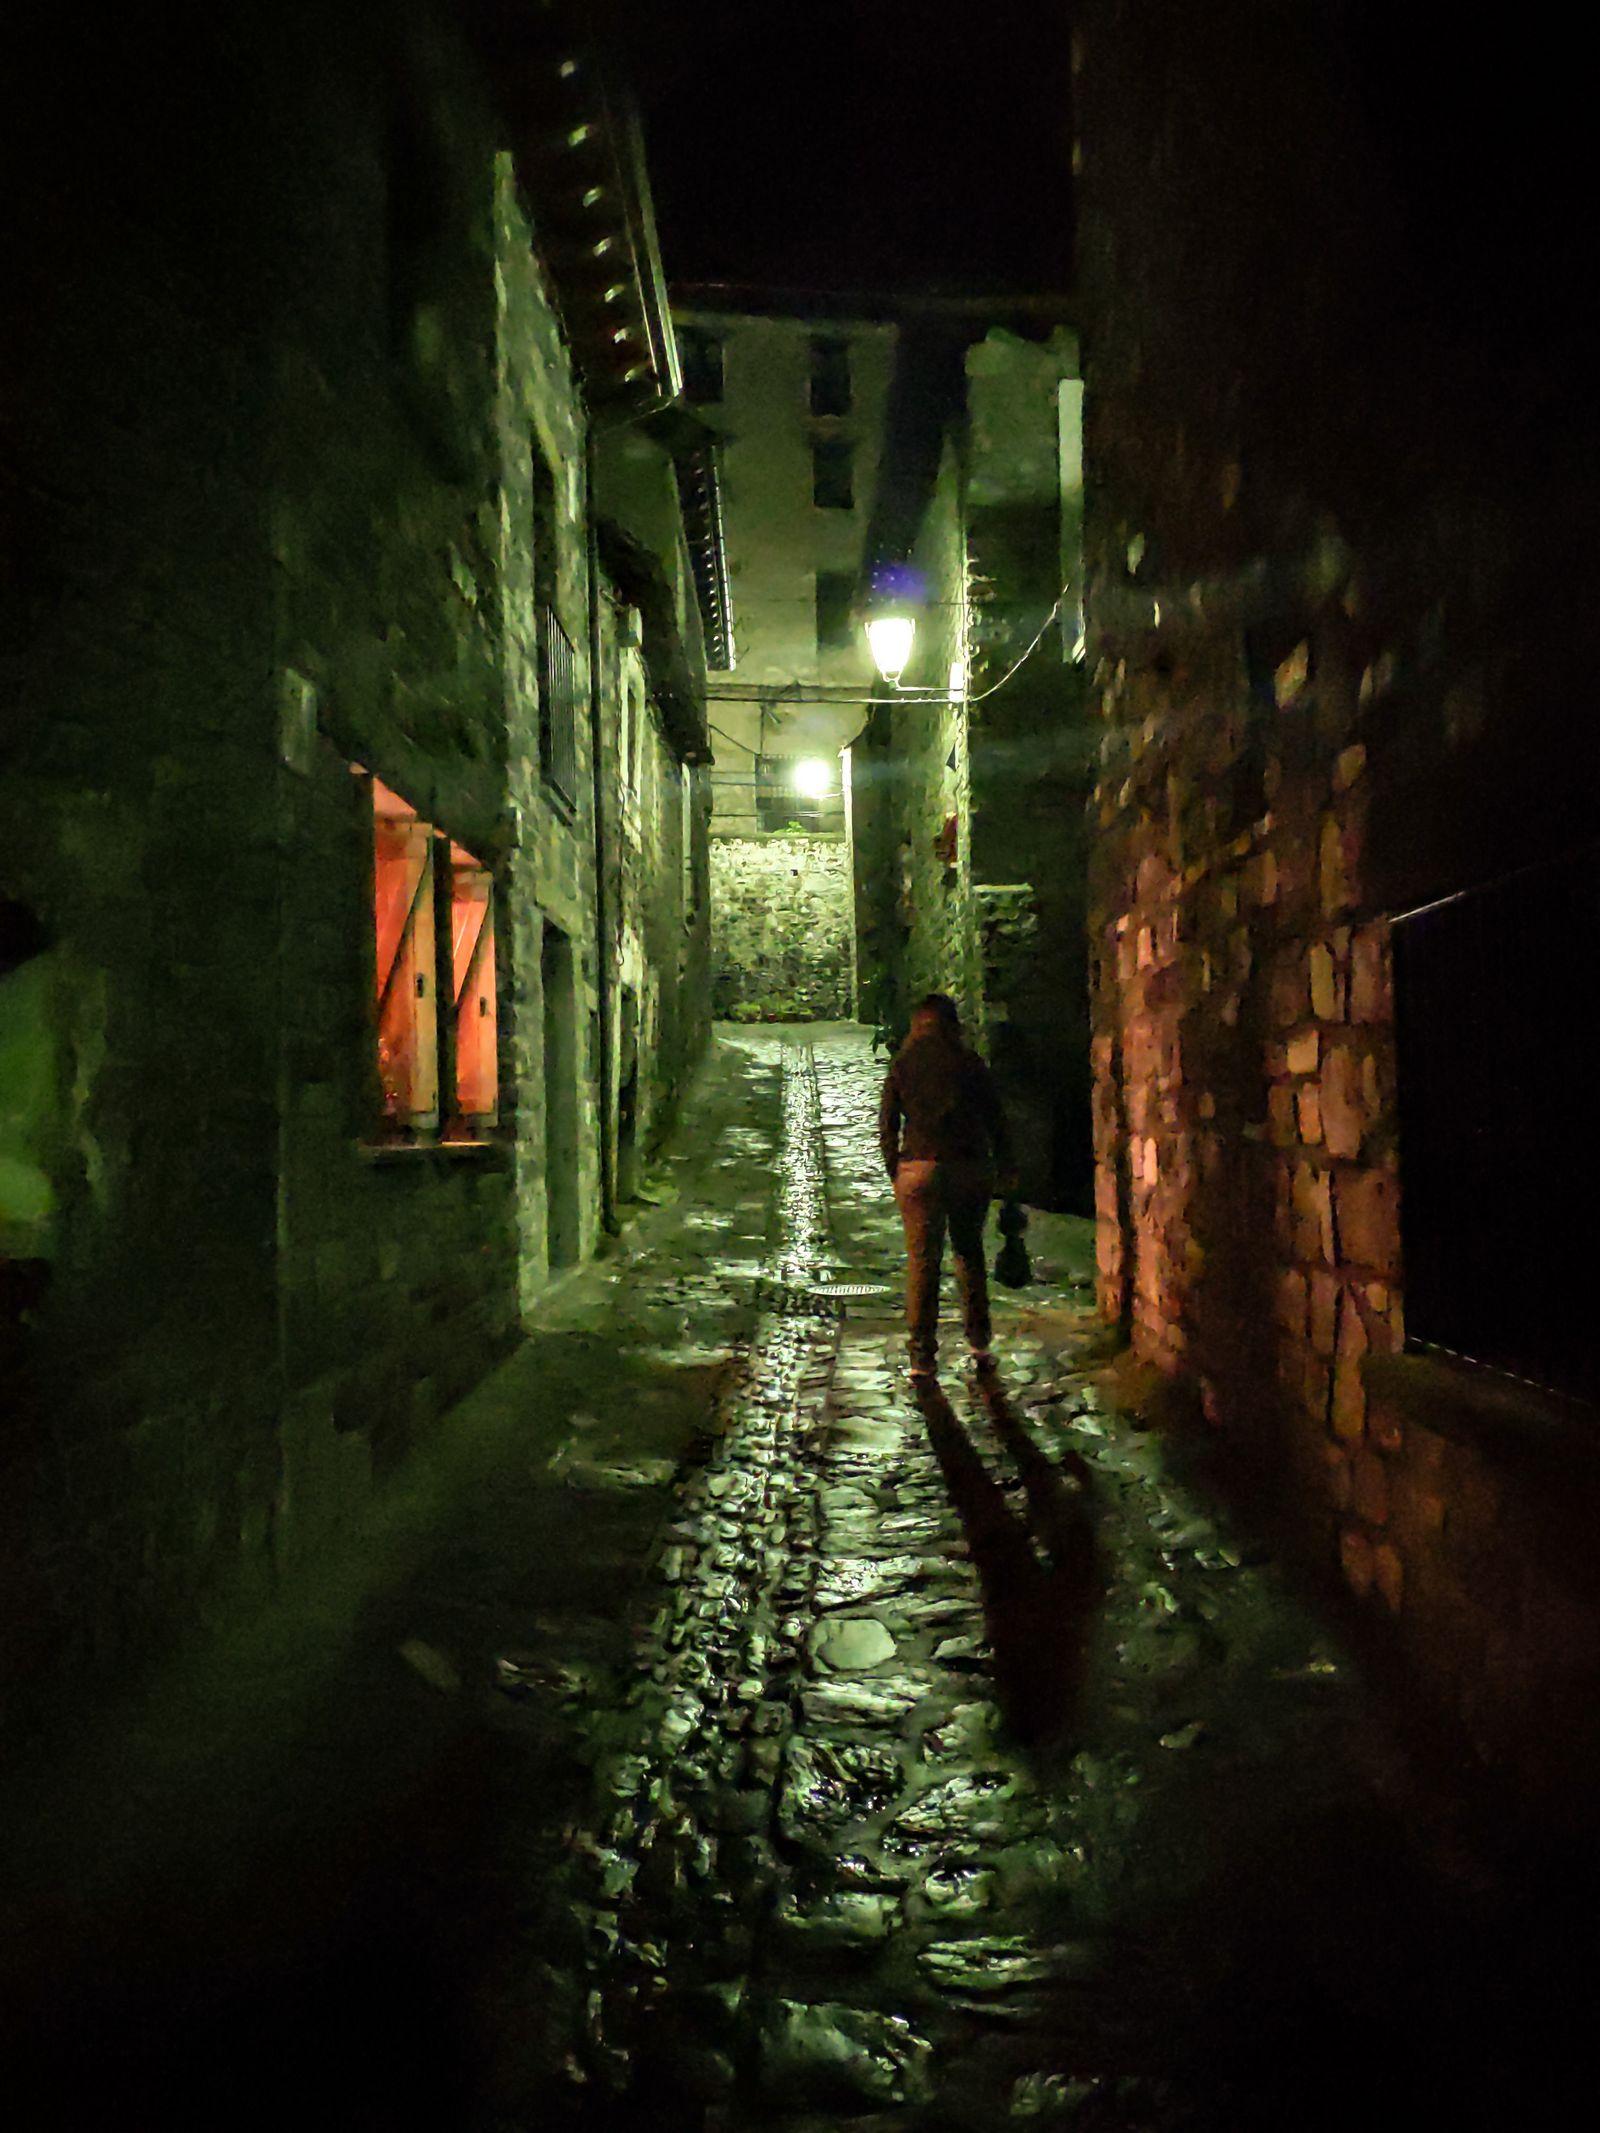 Las oscuras calles de Hecho